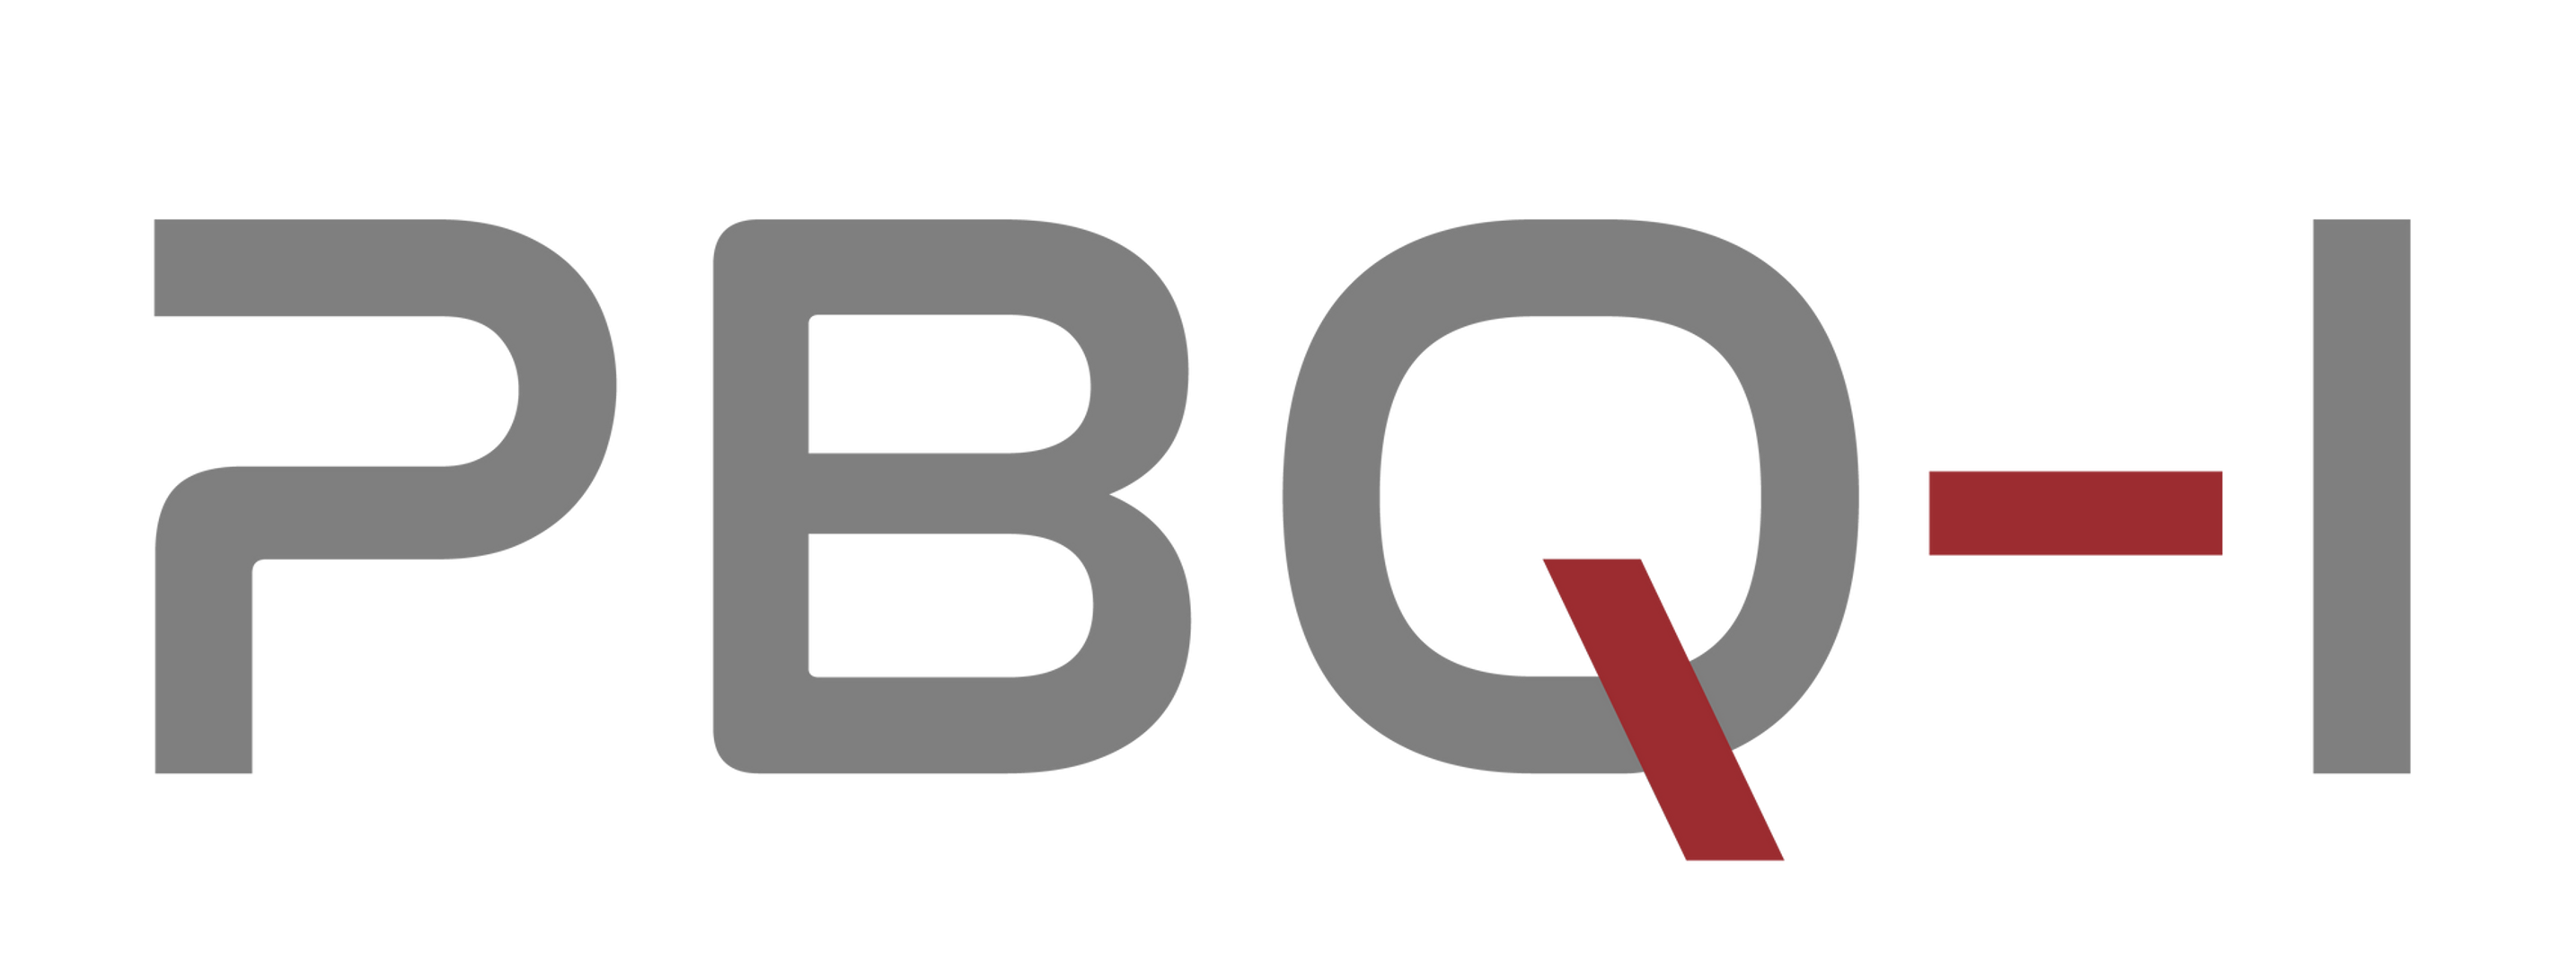 PBQ-I